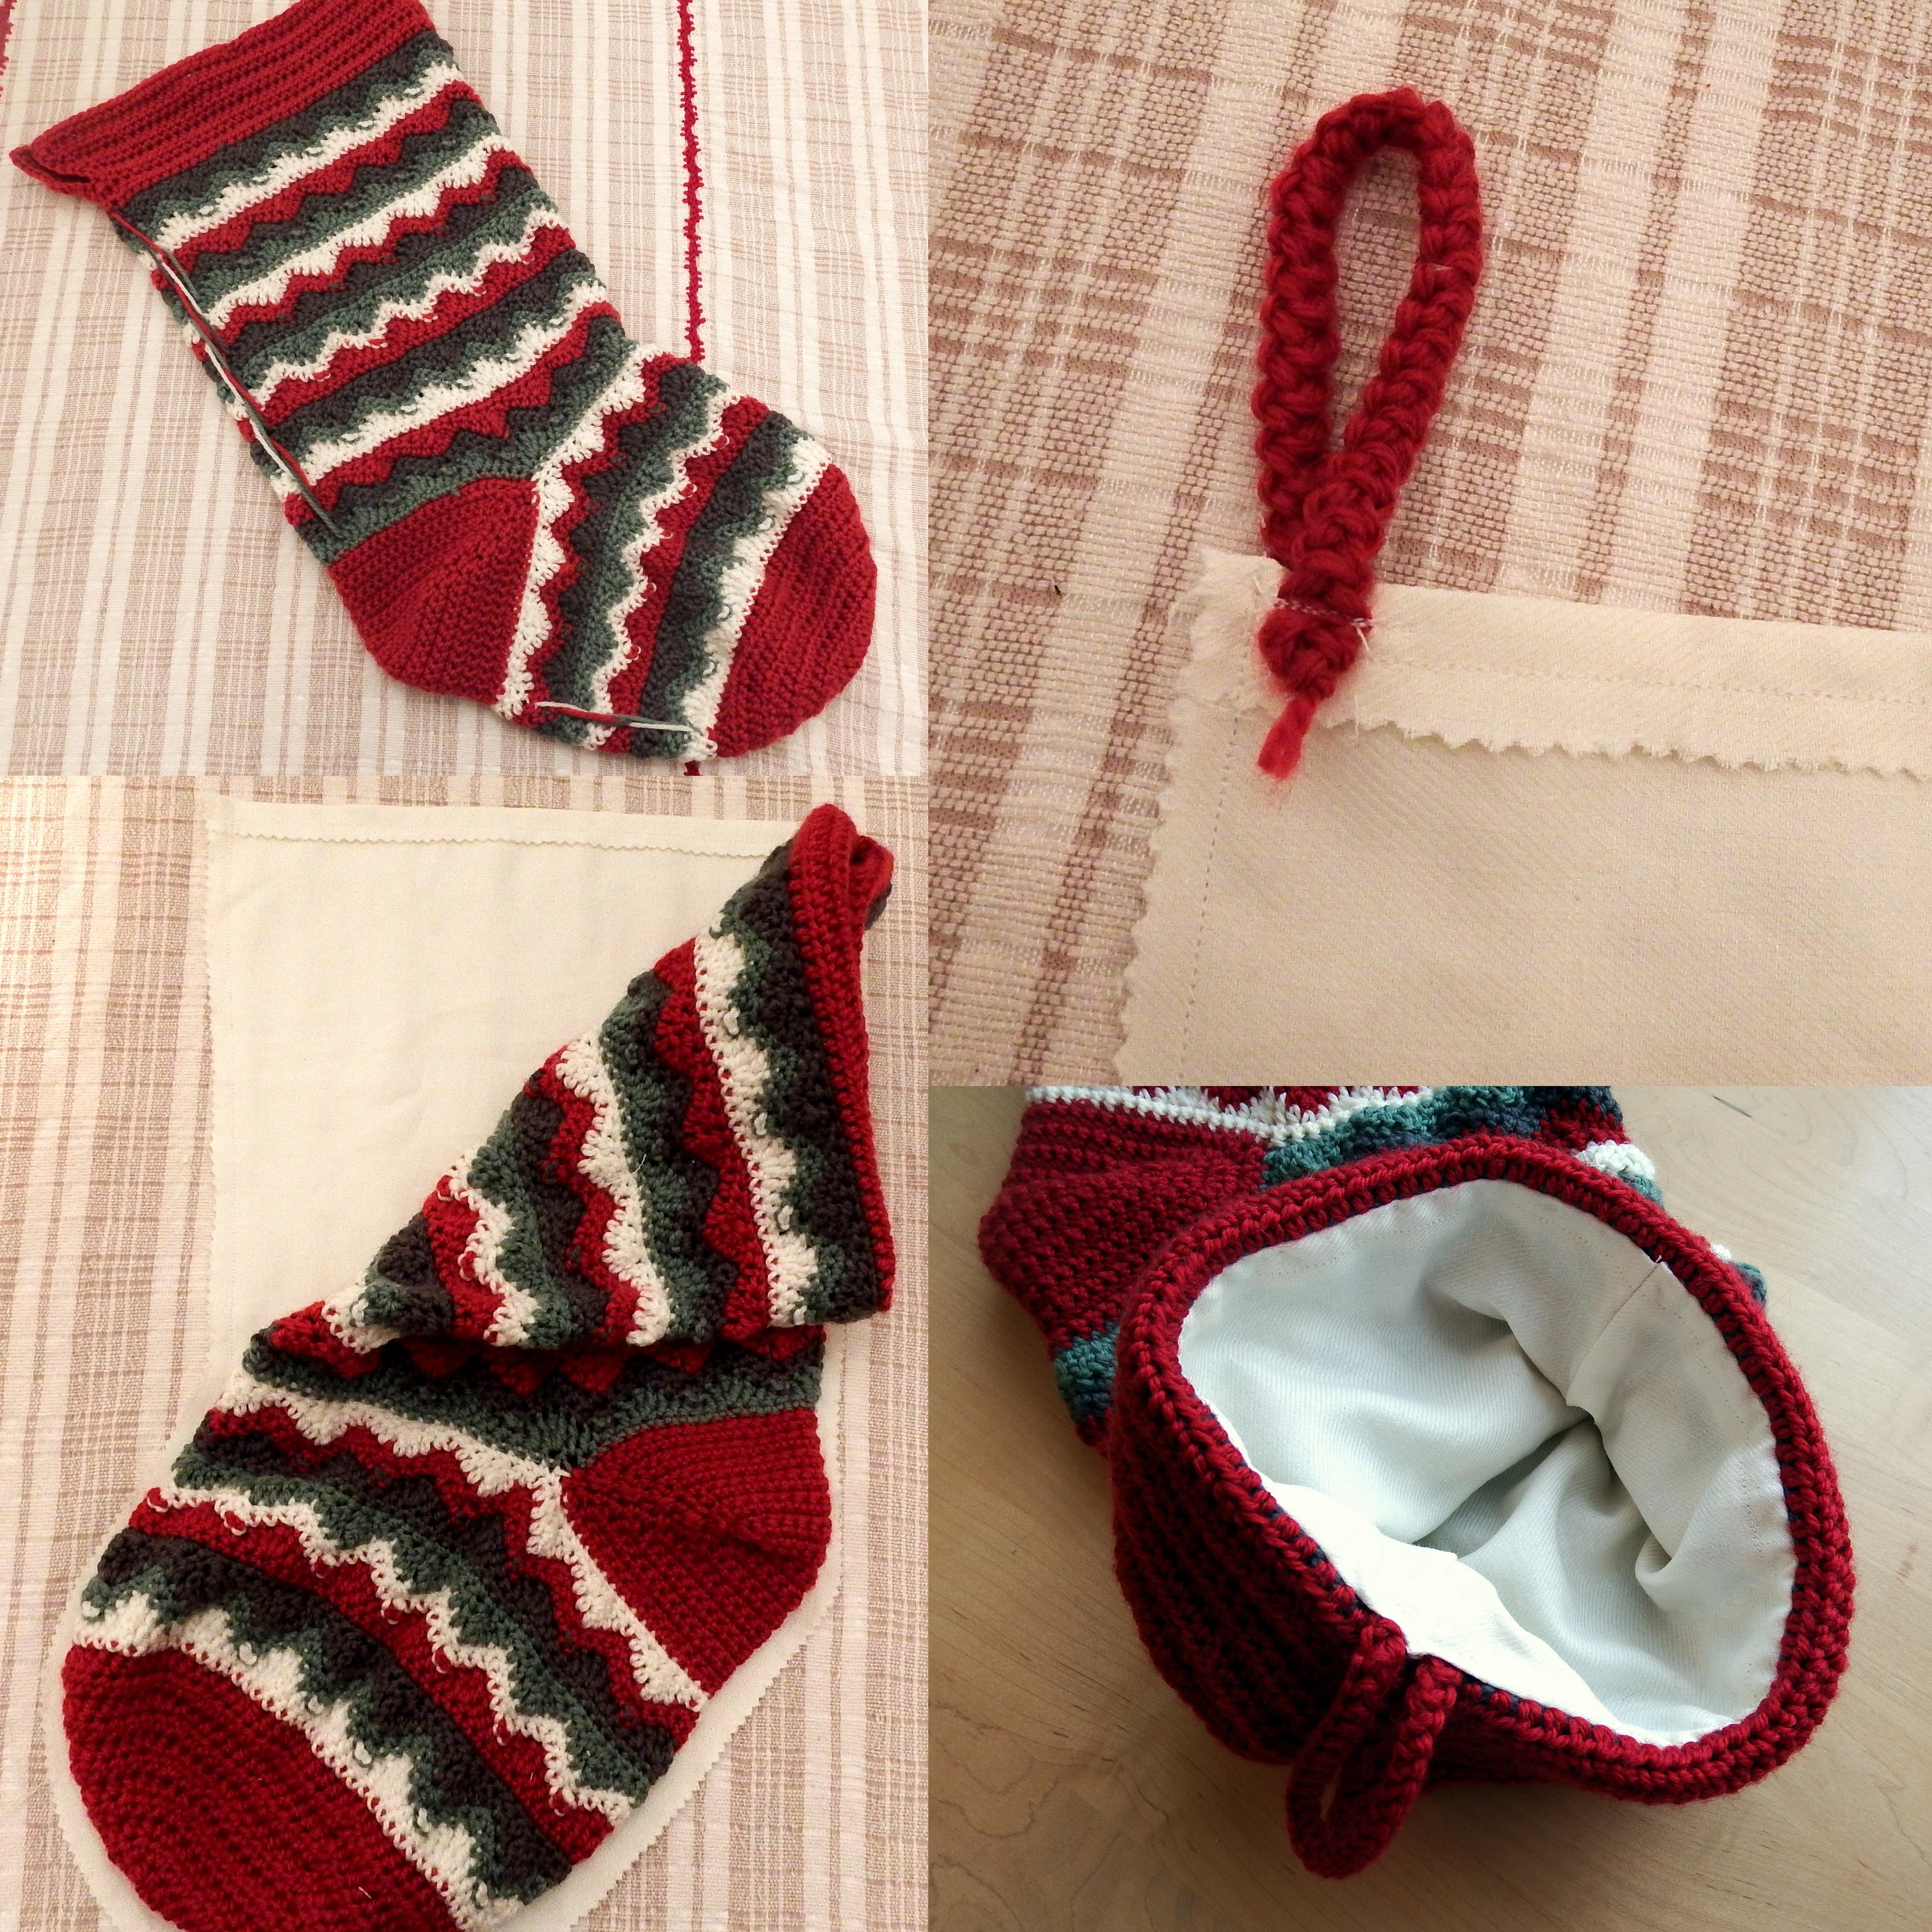 Christmas Stocking | Make My Day Creative